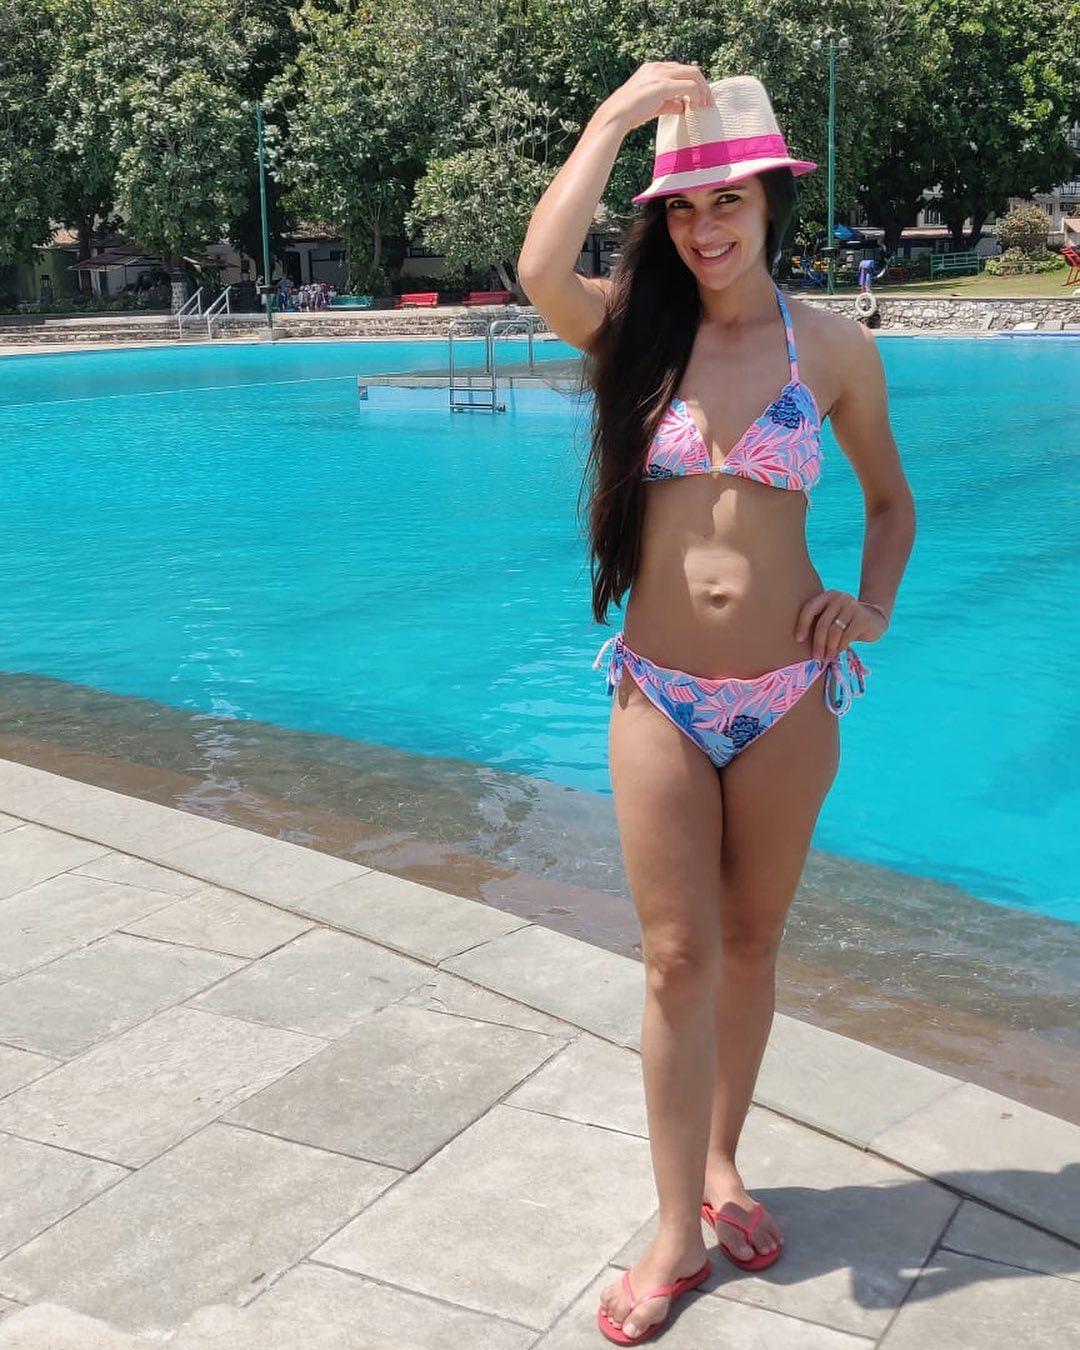 TARA SHARMA Hot Bikini Pics that are Trending Now. OMG! - Celebrity News and Gossips, Serial Actress, Latest Jobs, Health Tips, 2021 Quotes - BotiBuzz